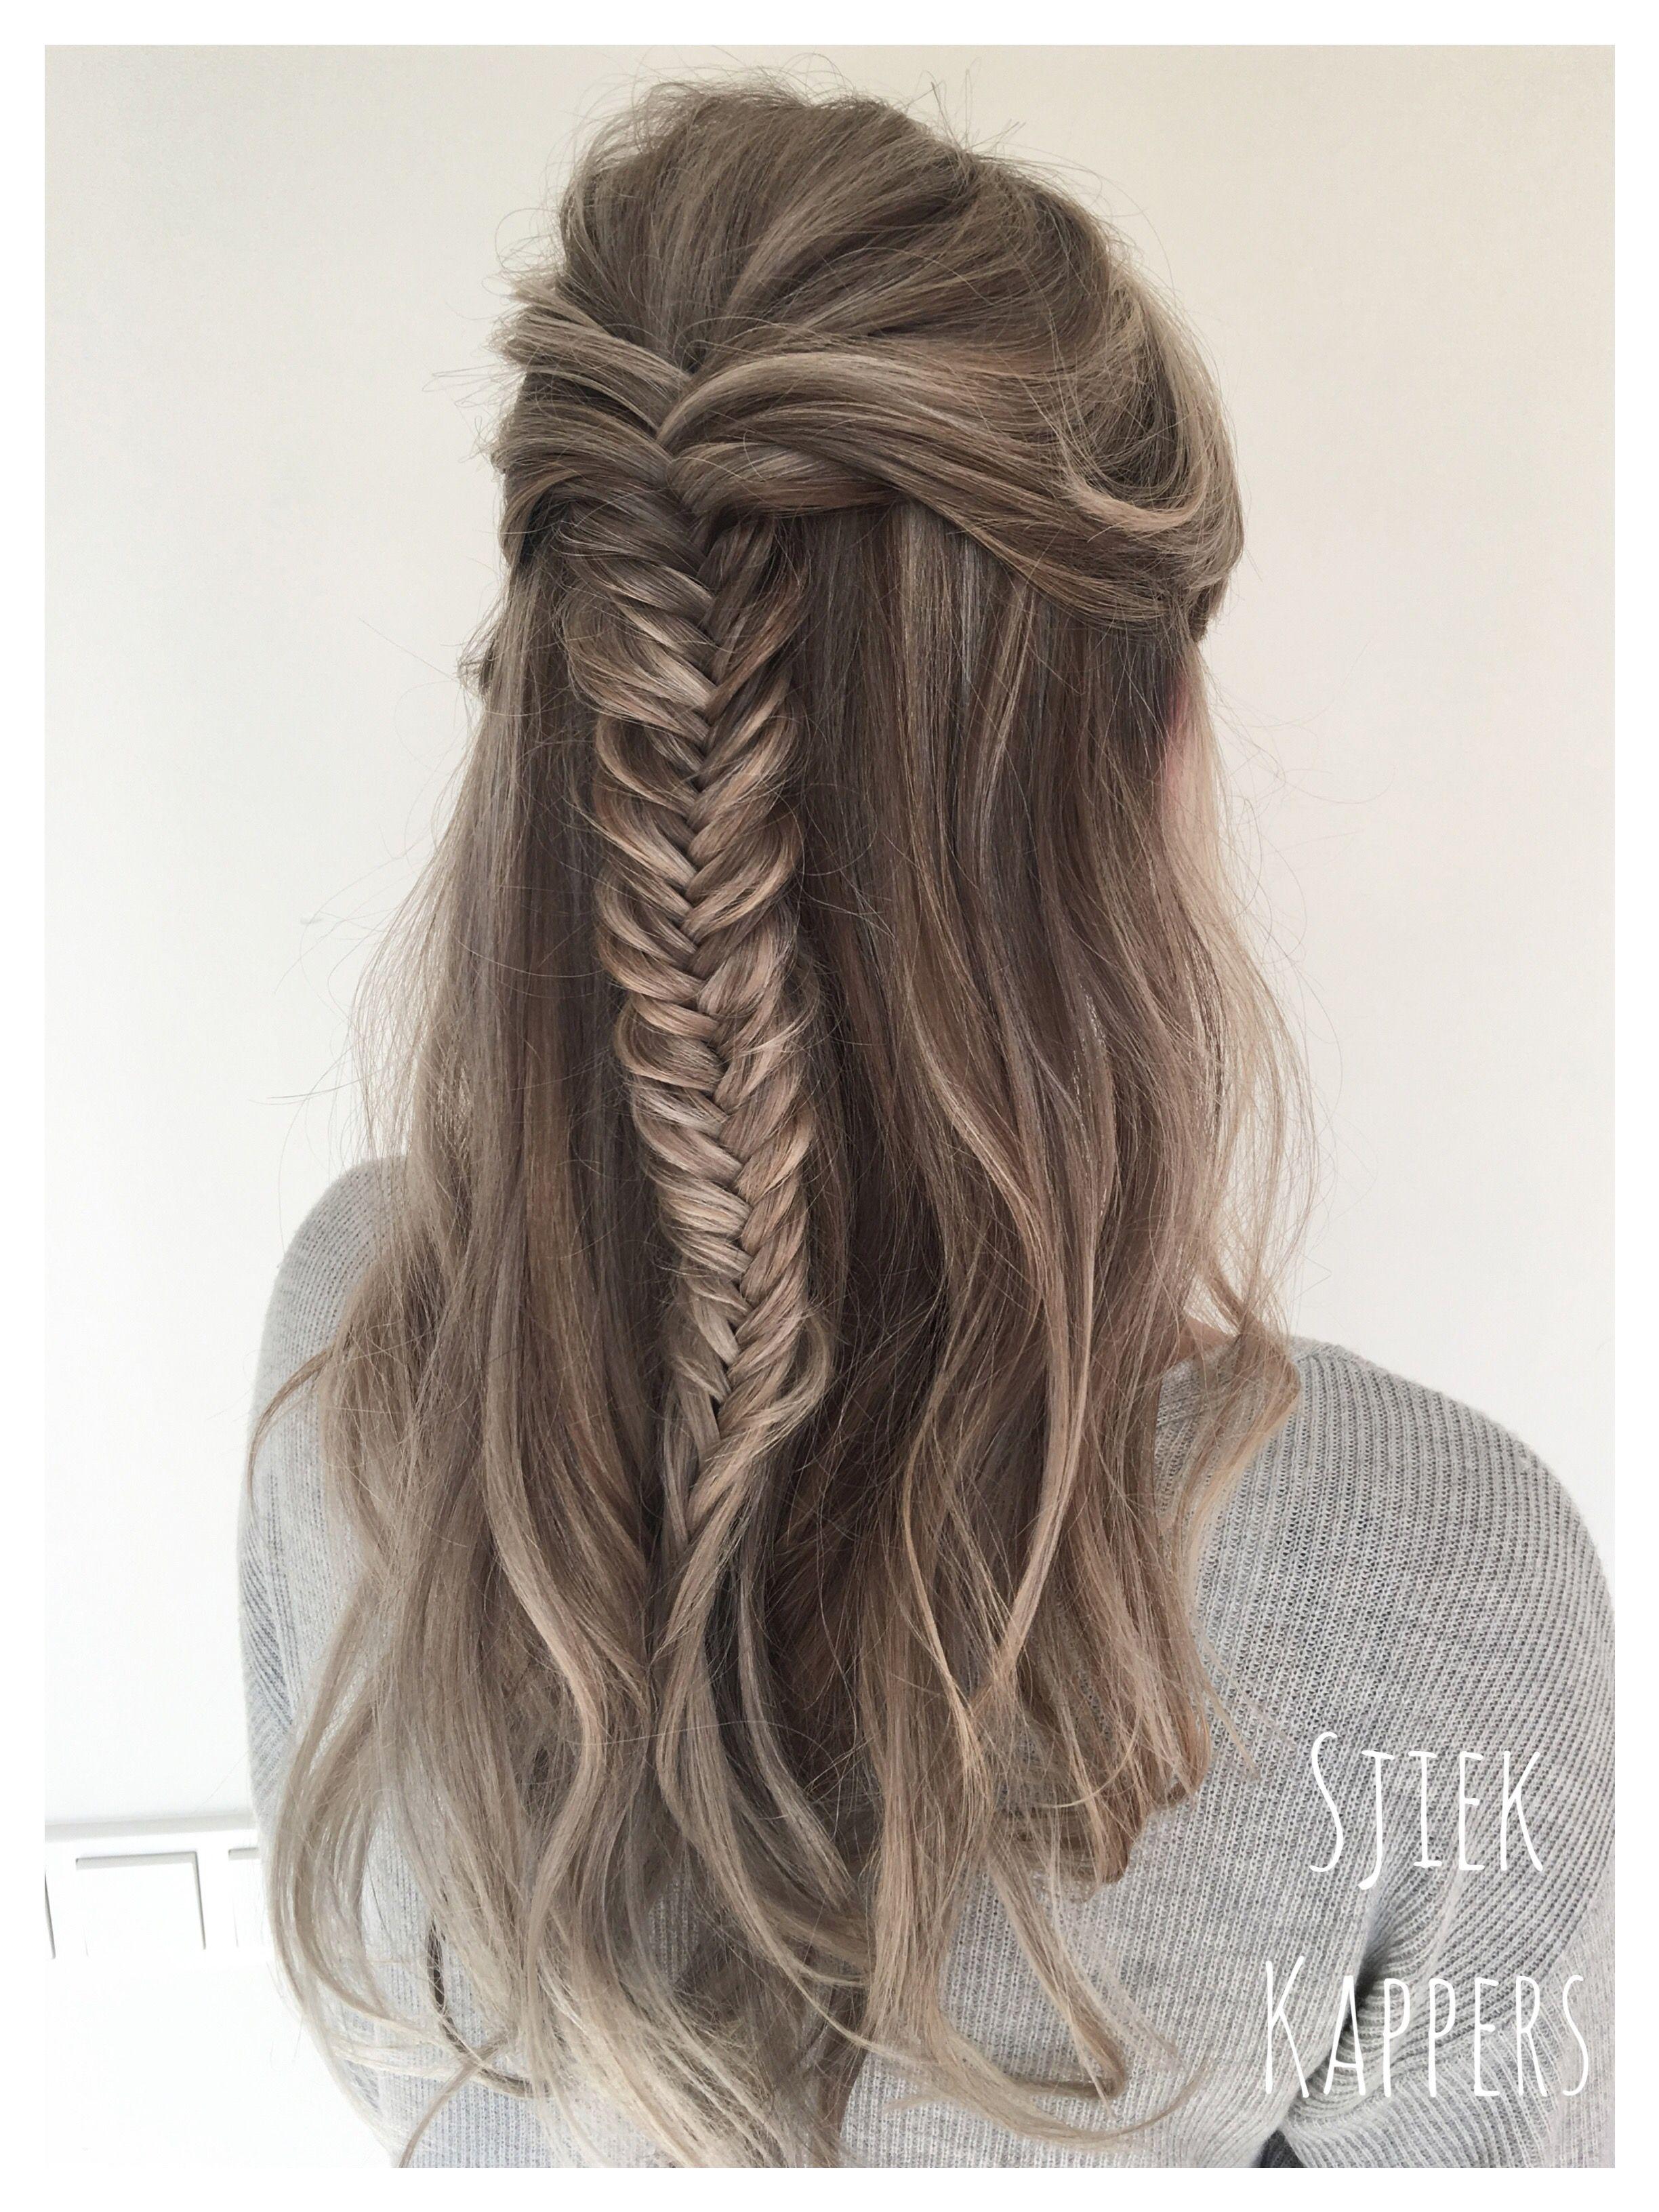 Half up half down fishtail braid hair updo ashy blonde